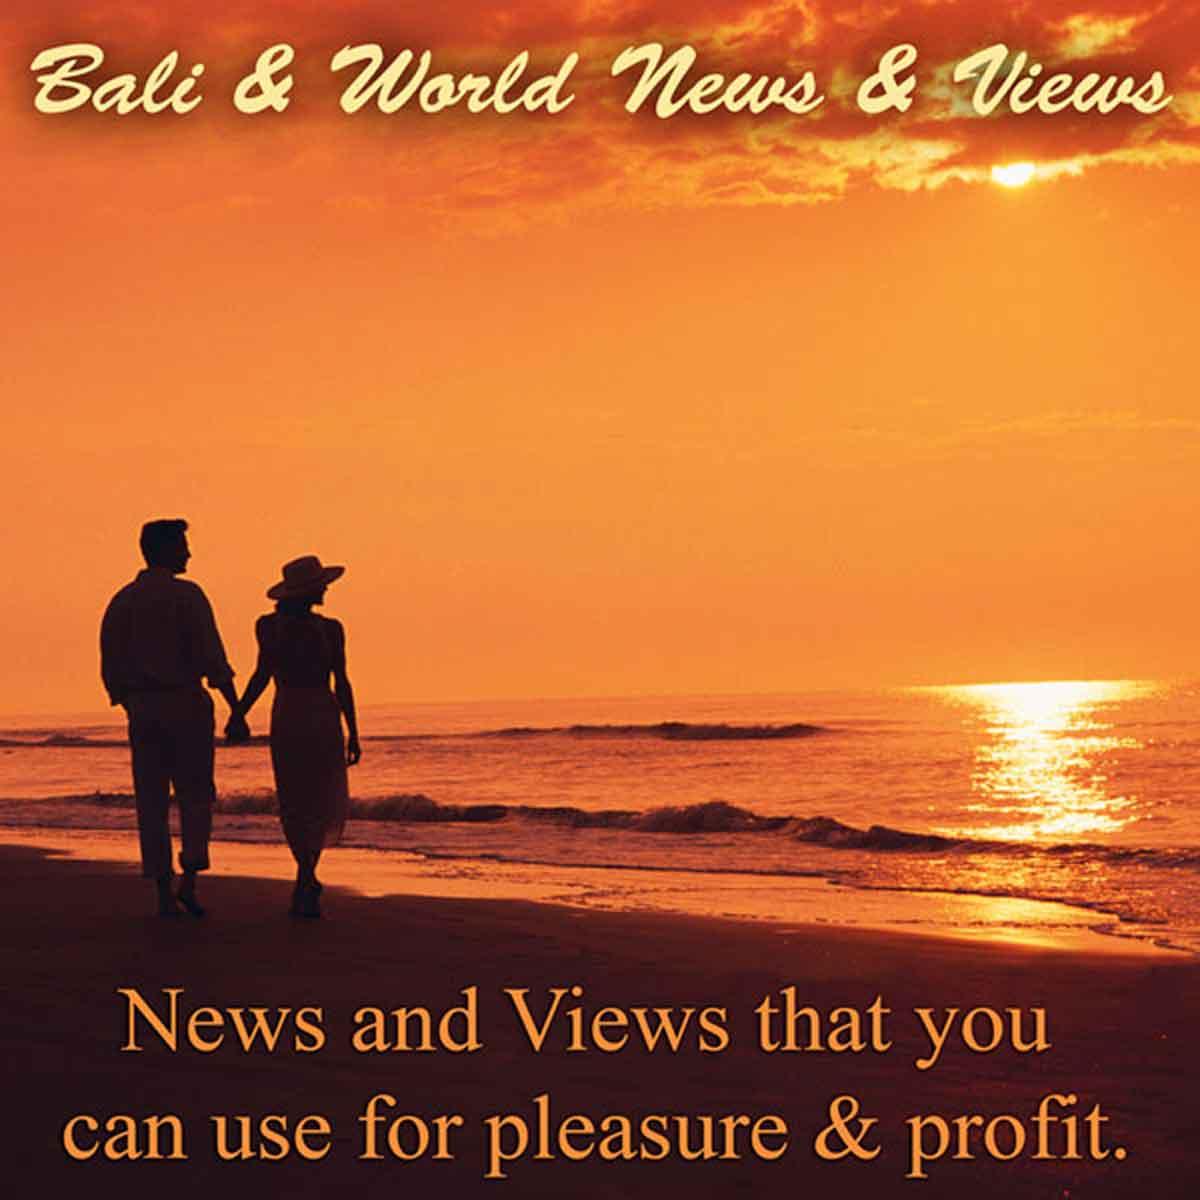 Bali & World News & Views & Bali News and Views